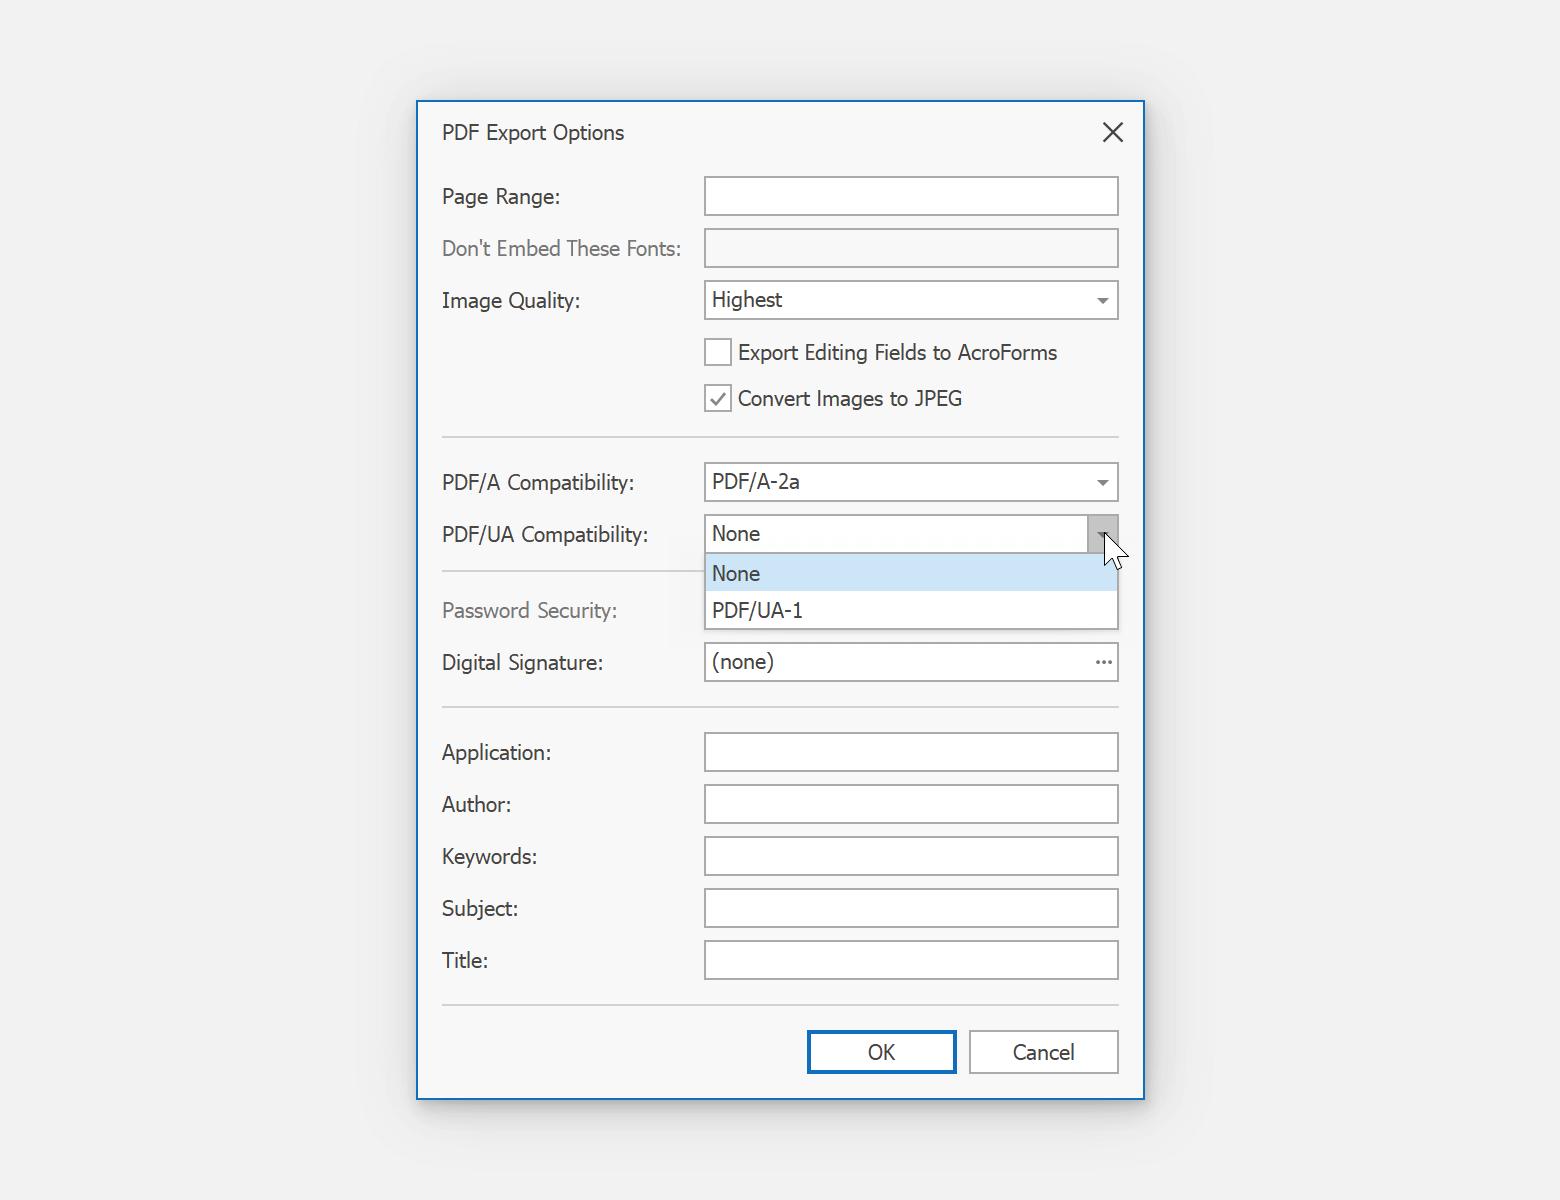 PDF Export Options - PDF/UA and PDF/A-2a Support